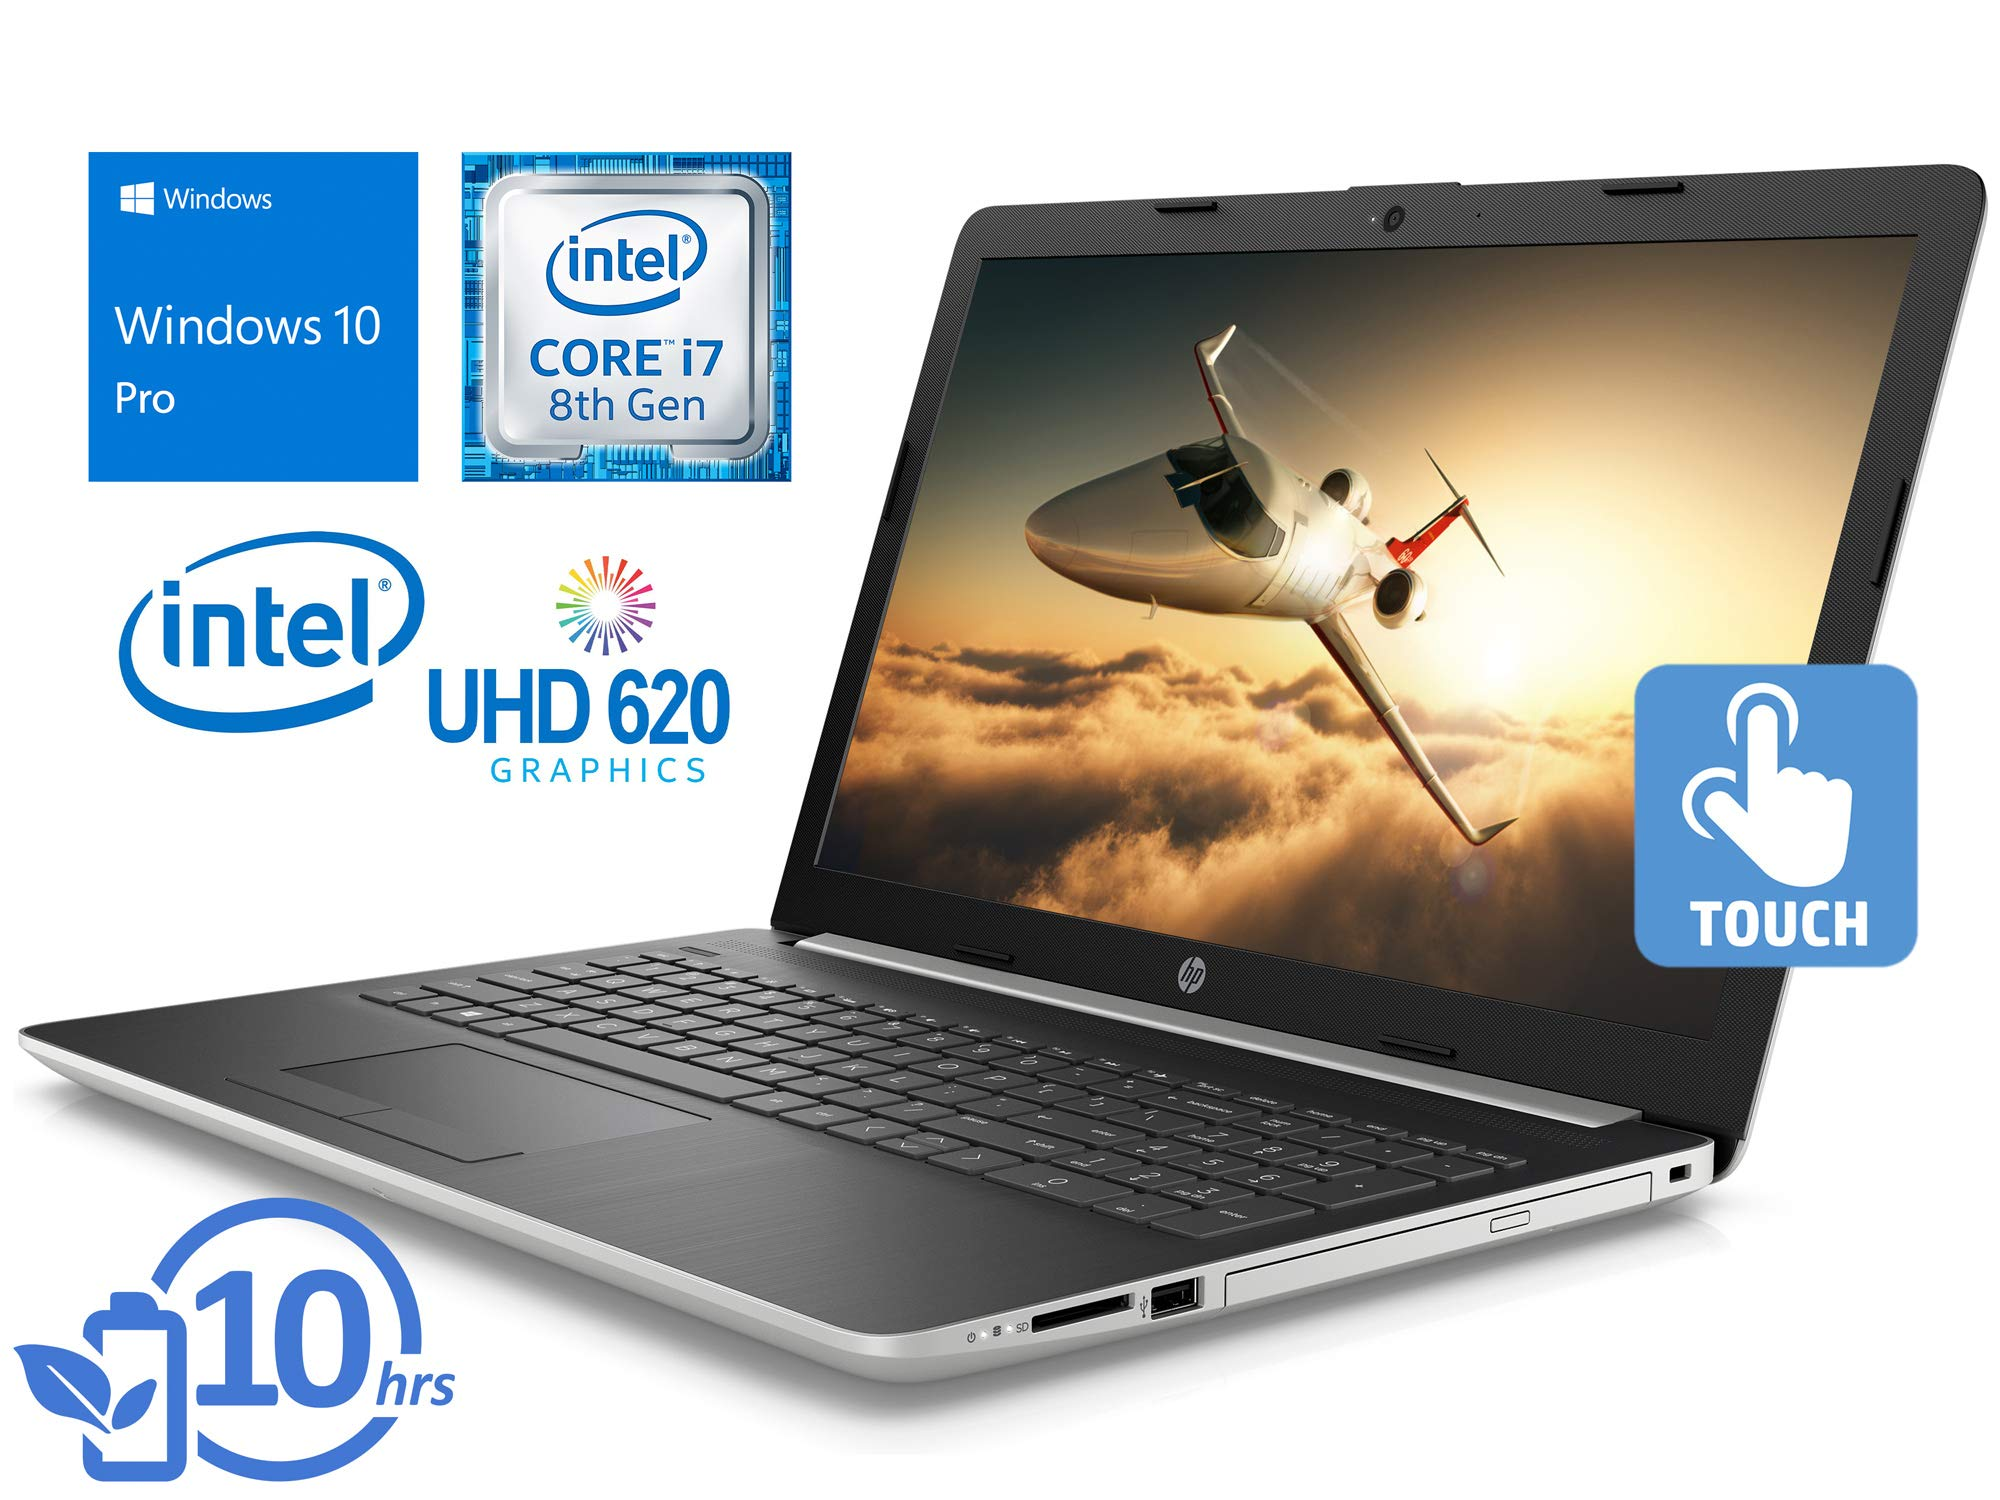 "HP 15 Laptop, 15.6"" HD Touch Display, Intel Core i7-8550U Upto 4.0GHz, 8GB RAM, 1TB NVMe SSD + 1TB HDD, DVDRW, HDMI, Card Reader, Wi-Fi, Bluetooth, Windows 10 Pro"